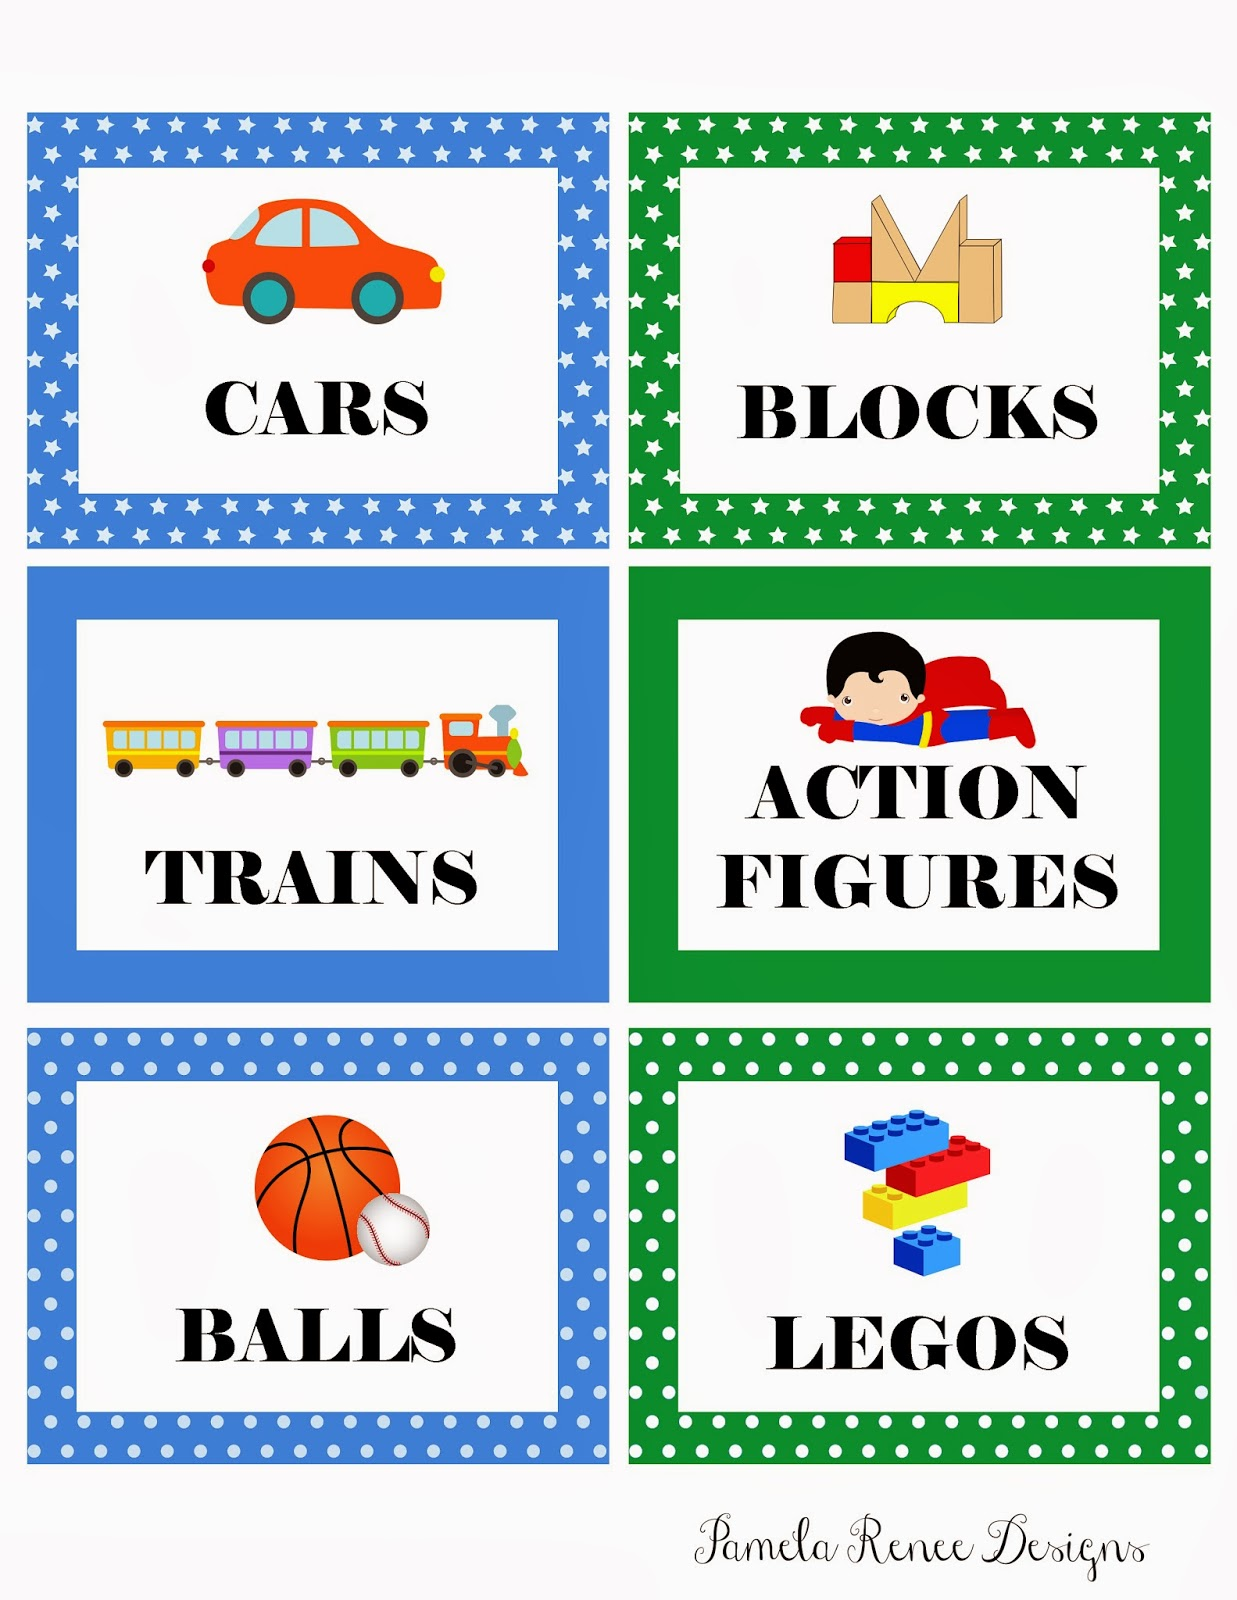 Boy Toys Template : Pamela renee designs free printable boy s toy bin labels